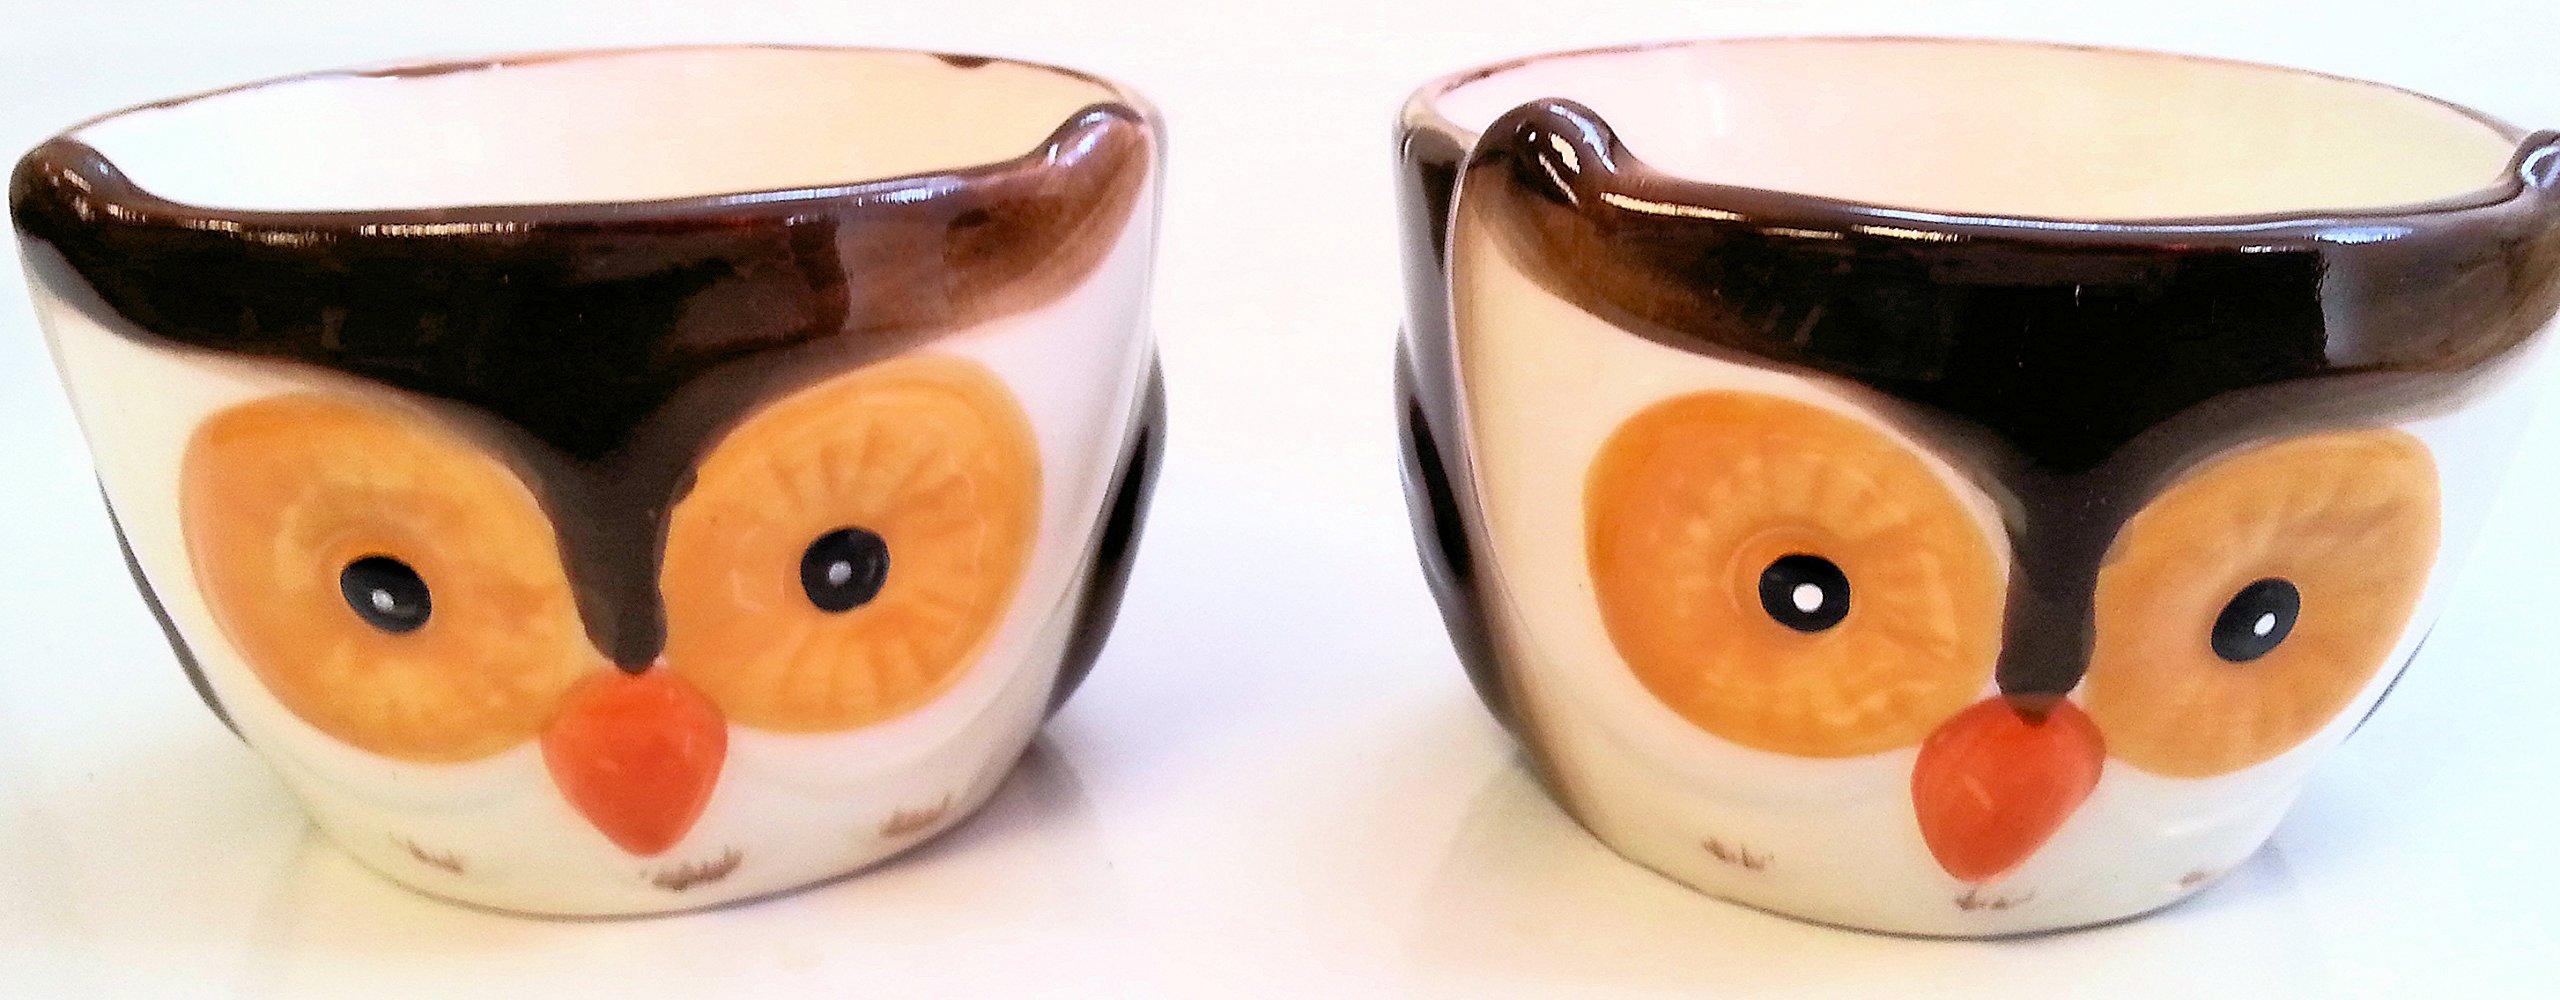 Set of 2 Owl Ceramic Ramekins, Dessert Bowl Dishes by WM